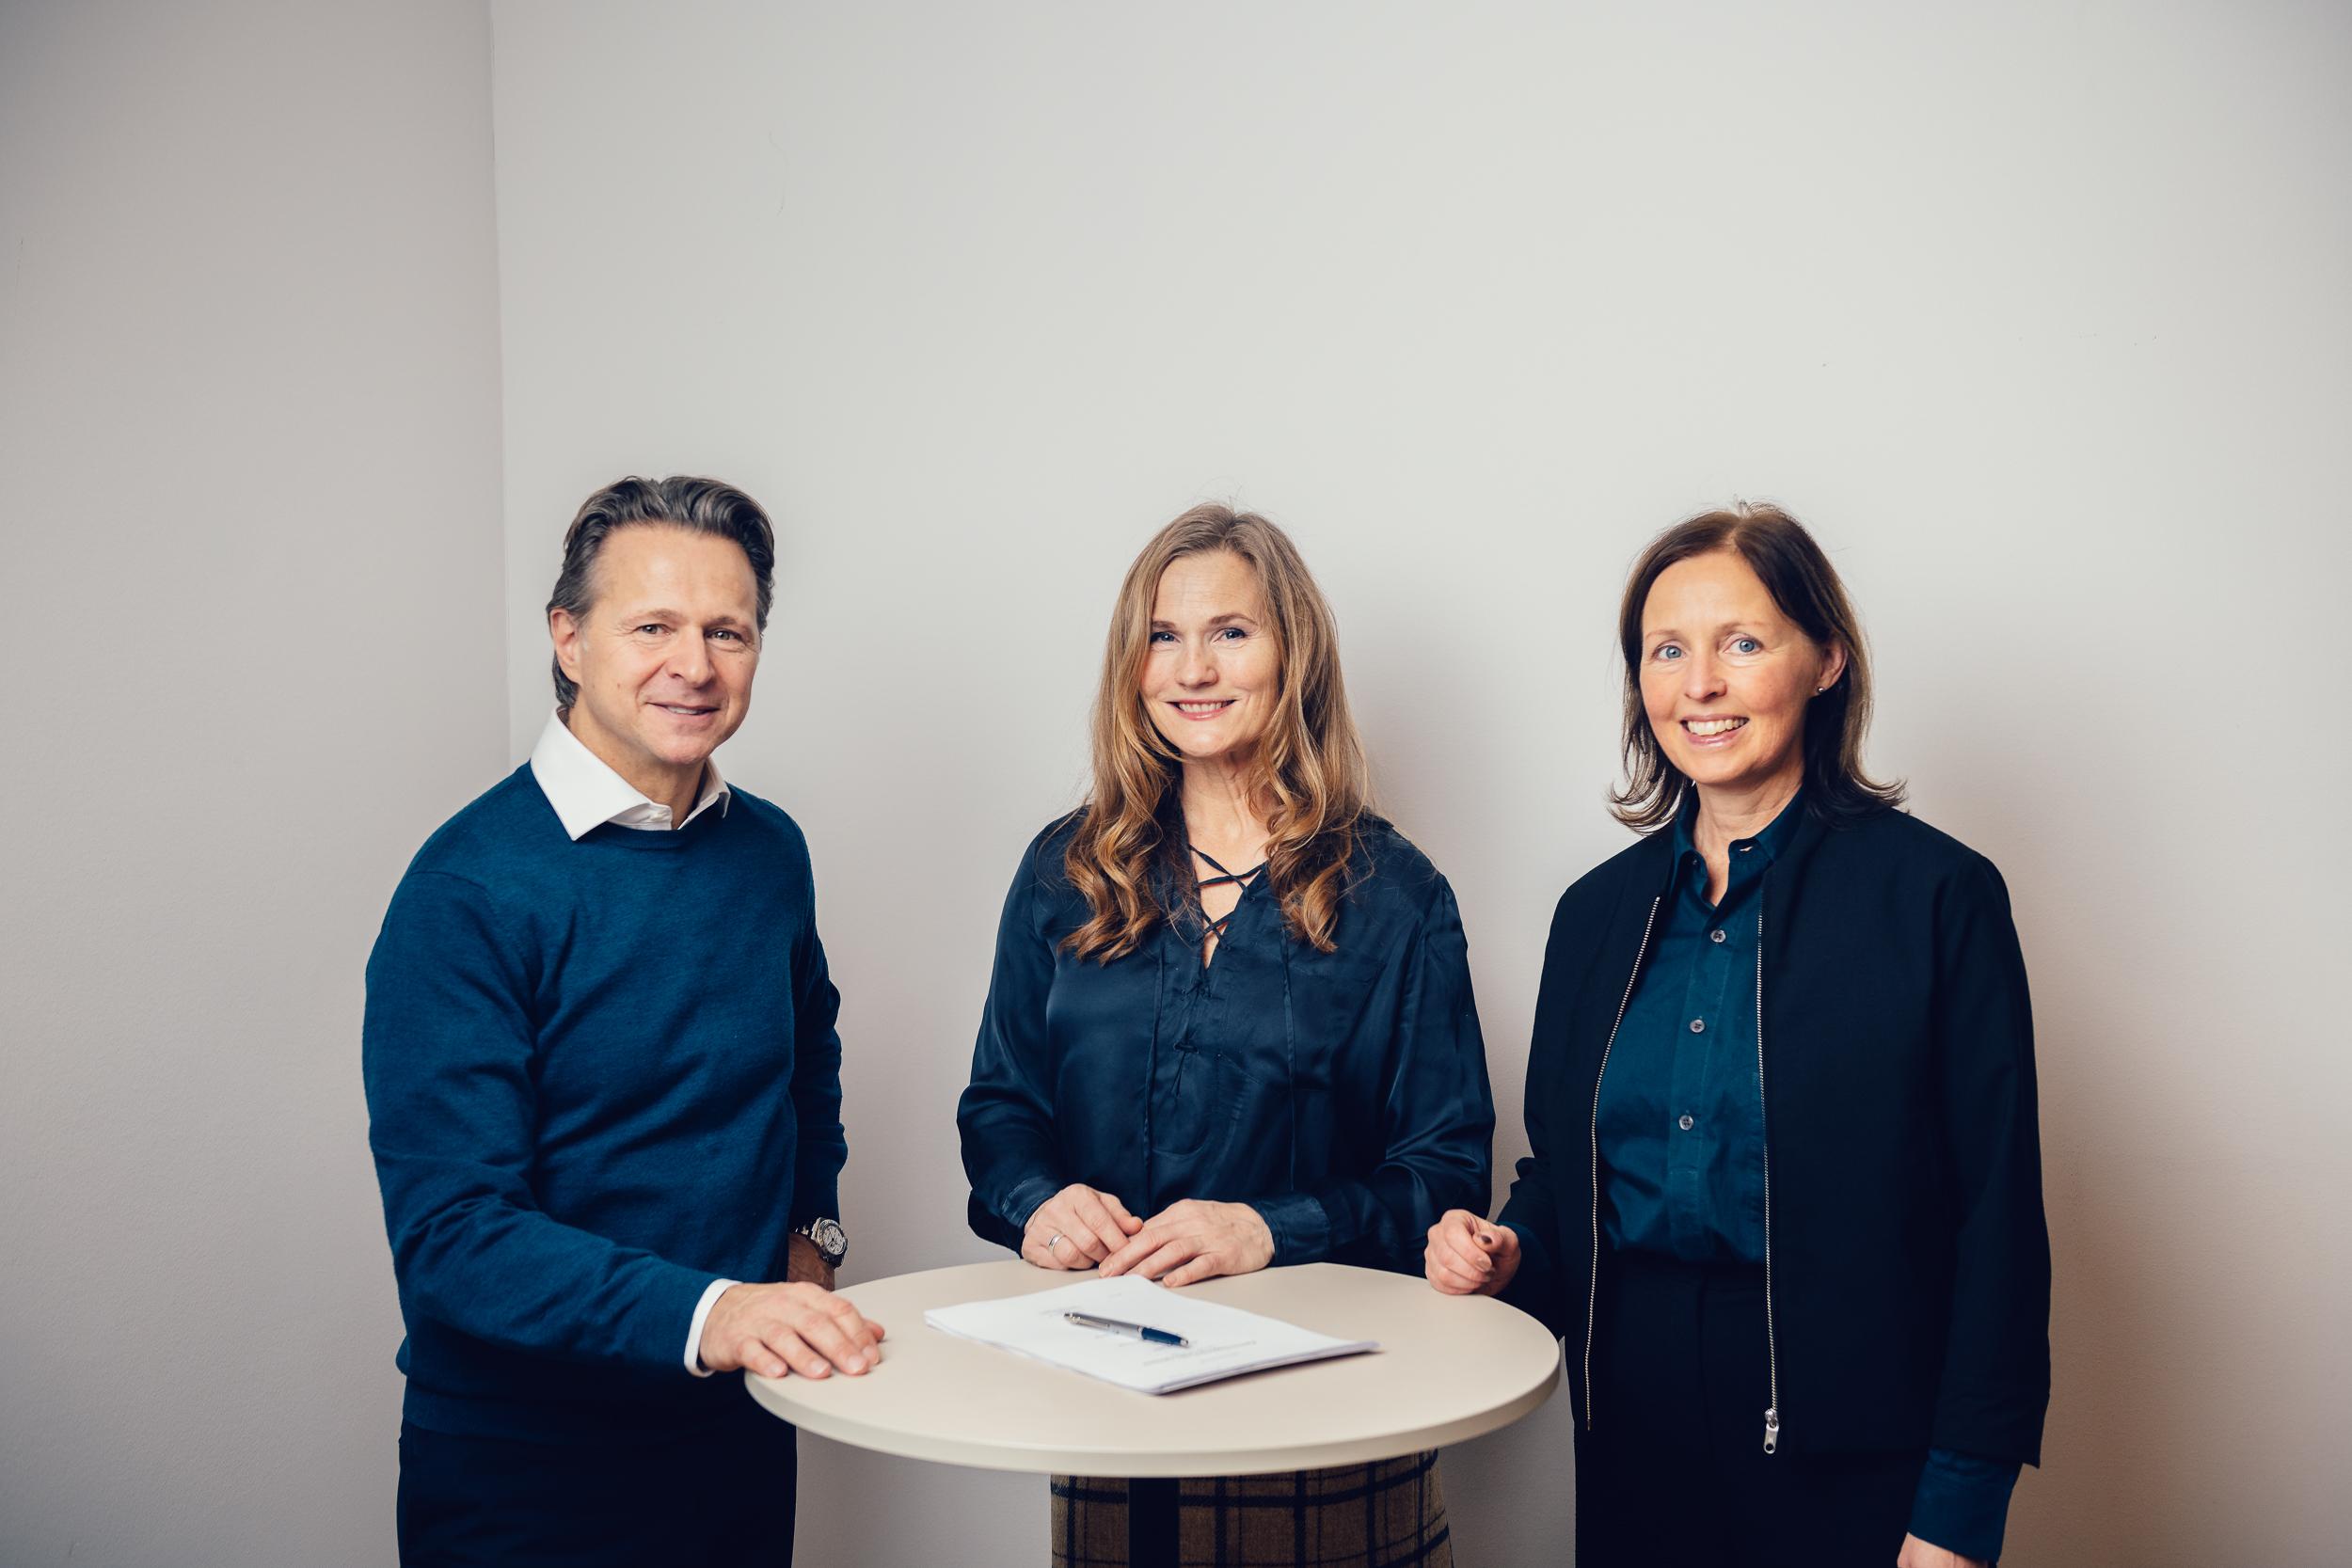 Patrik Lundström (CEO, Renewcell), Marica Bixo (Director – Export & Project Finance, Nordea) and Anna Karin Ljung (Senior Client Executive, SEK) Photo: Alexander Donka